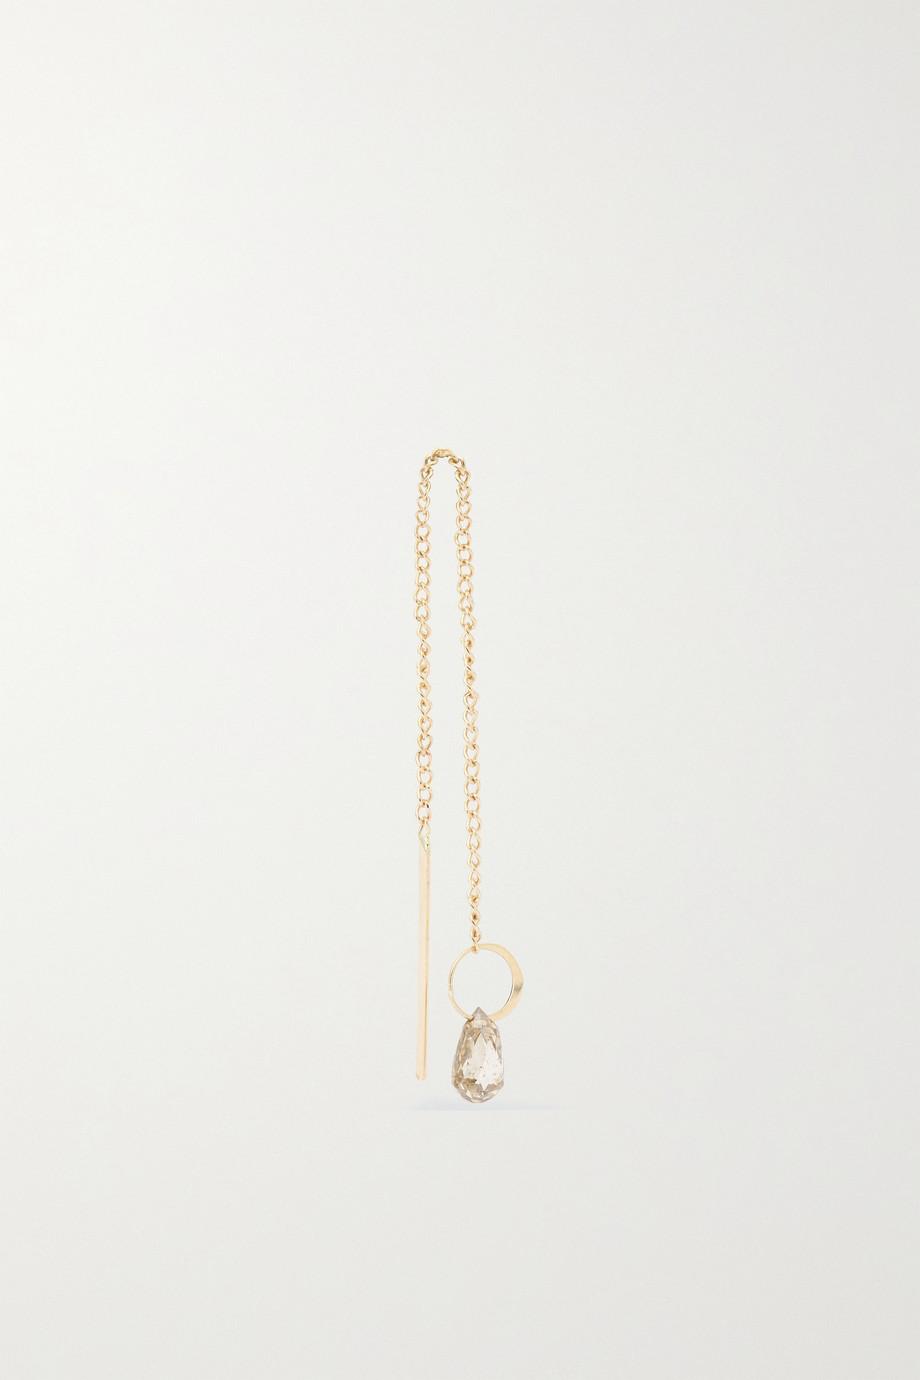 Melissa Joy Manning 14-karat recycled gold diamond earring